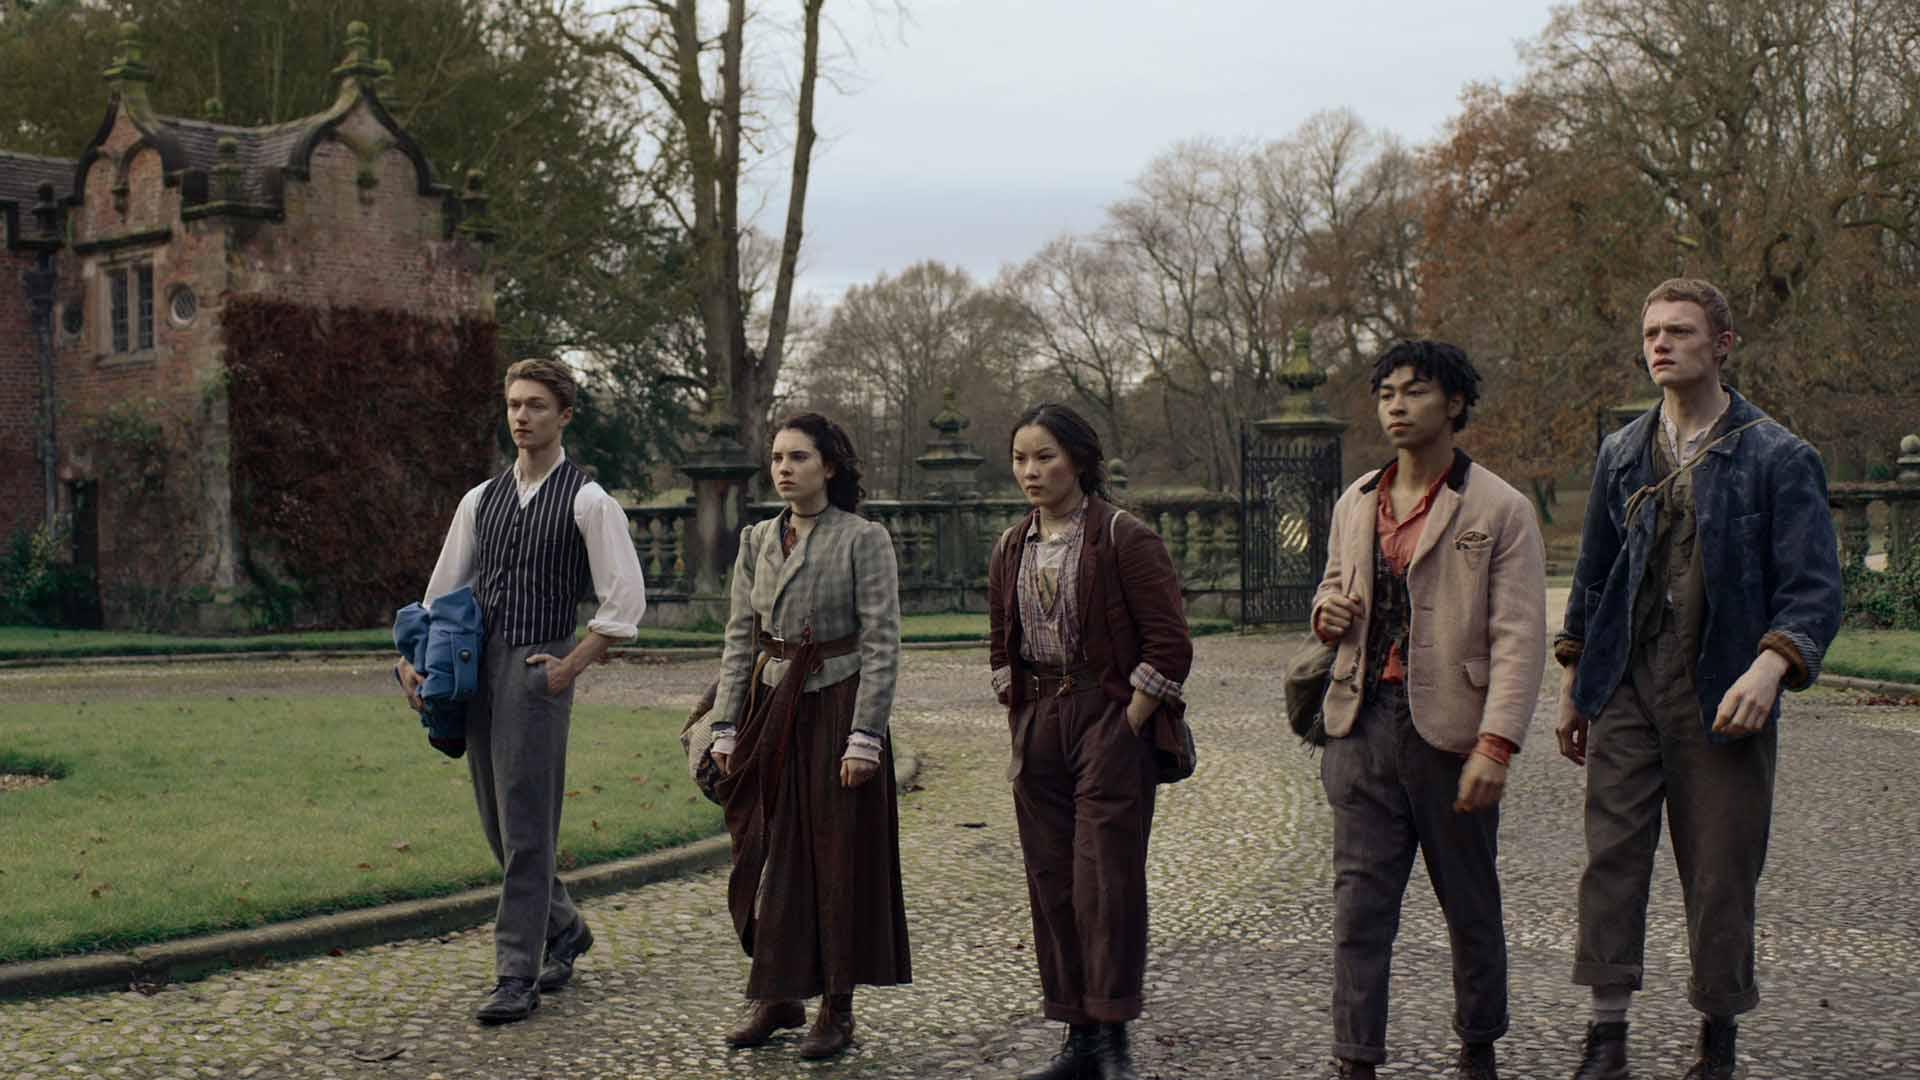 Netflix's New Supernatural Drama 'The Irregulars' Introduces the Team Behind Sherlock Holmes